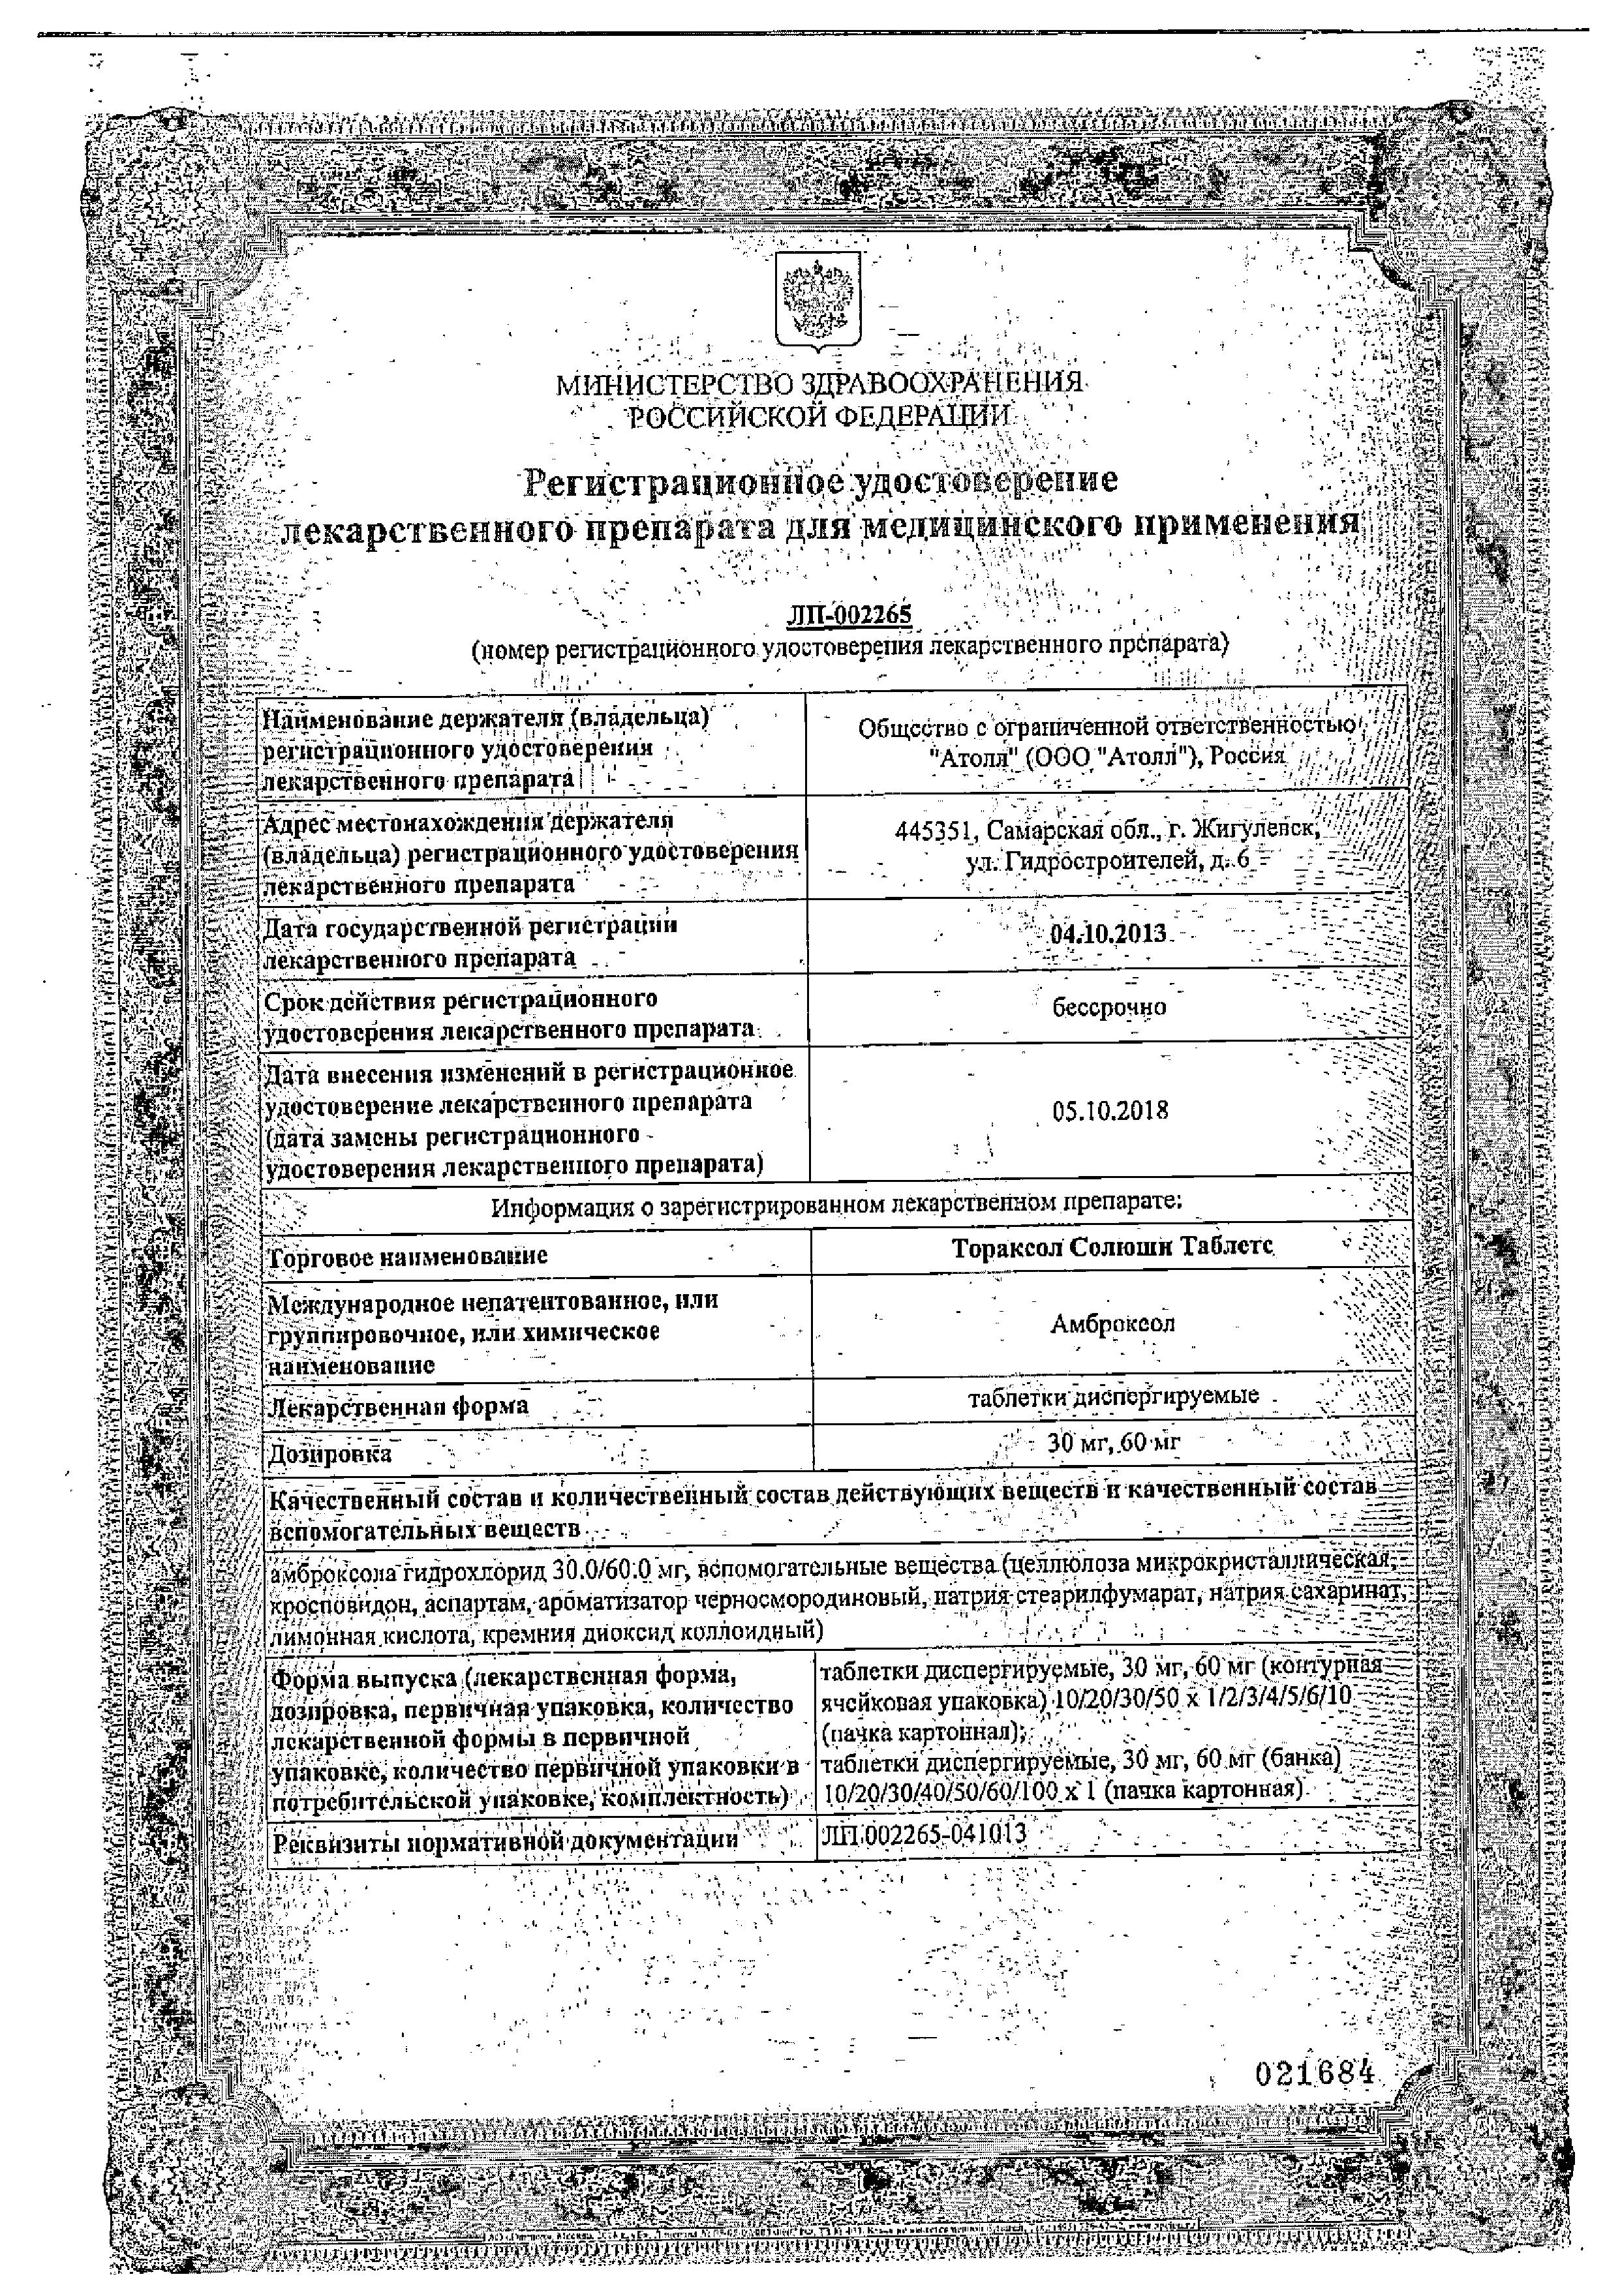 Тораксол Солюшн Таблетс сертификат